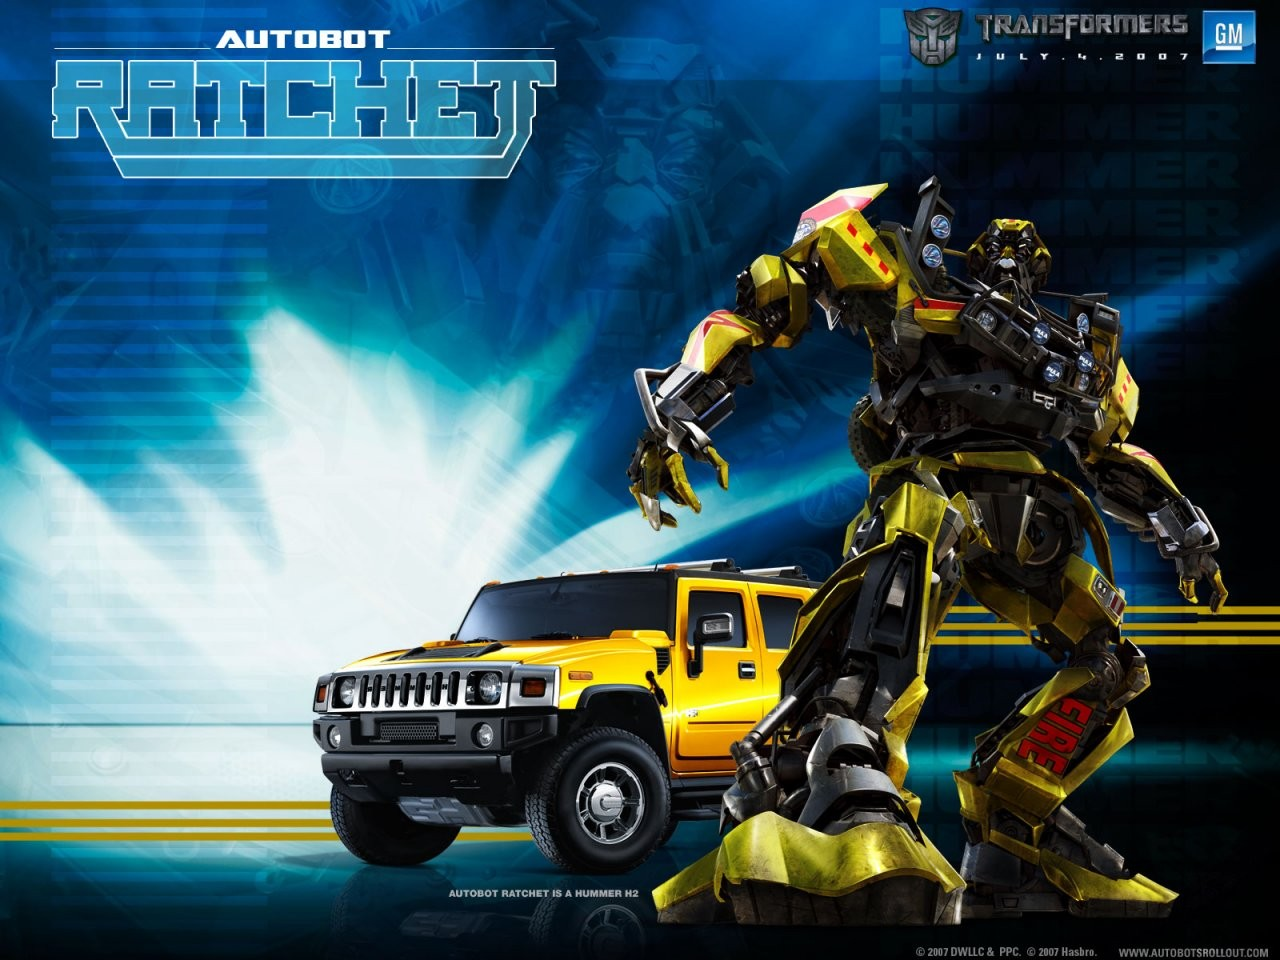 Transformers Wallpaper   Background Transformer   1280x960 1280x960